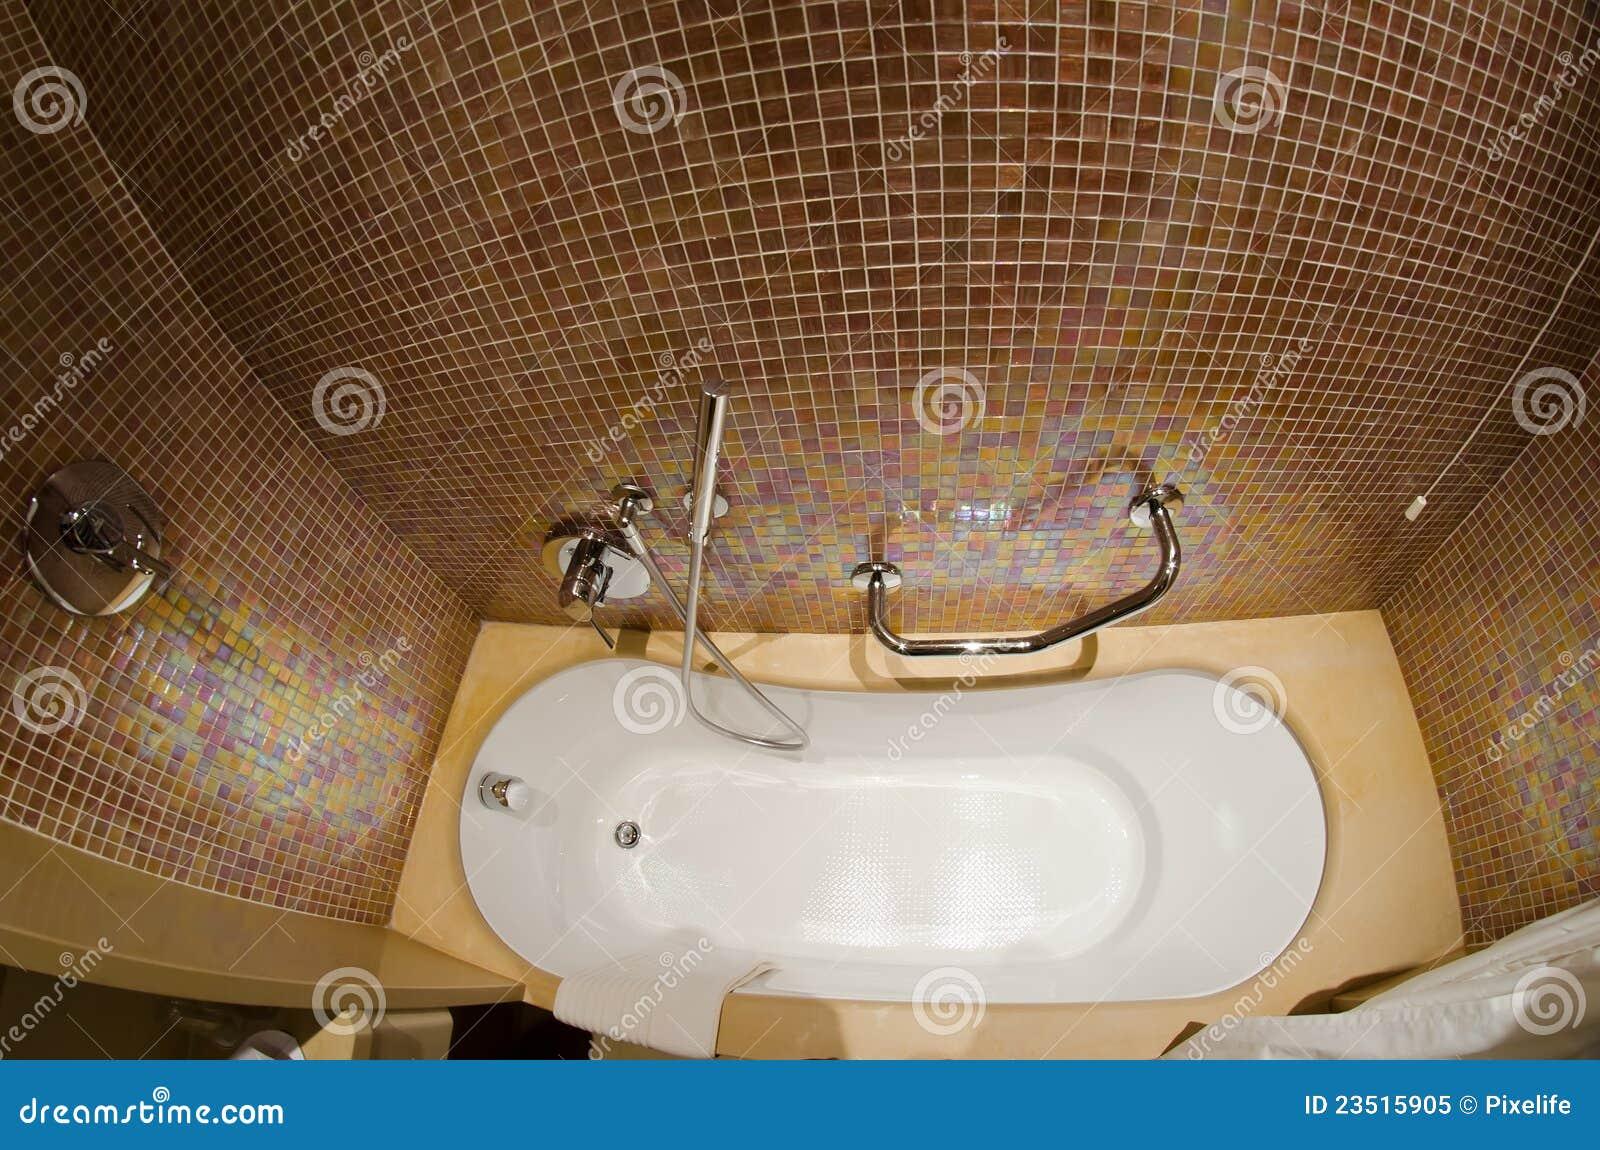 Banheiro Do Hotel De Luxo Foto de Stock Royalty Free Imagem  #86AB20 1300x951 Banheiro De Hotel De Luxo